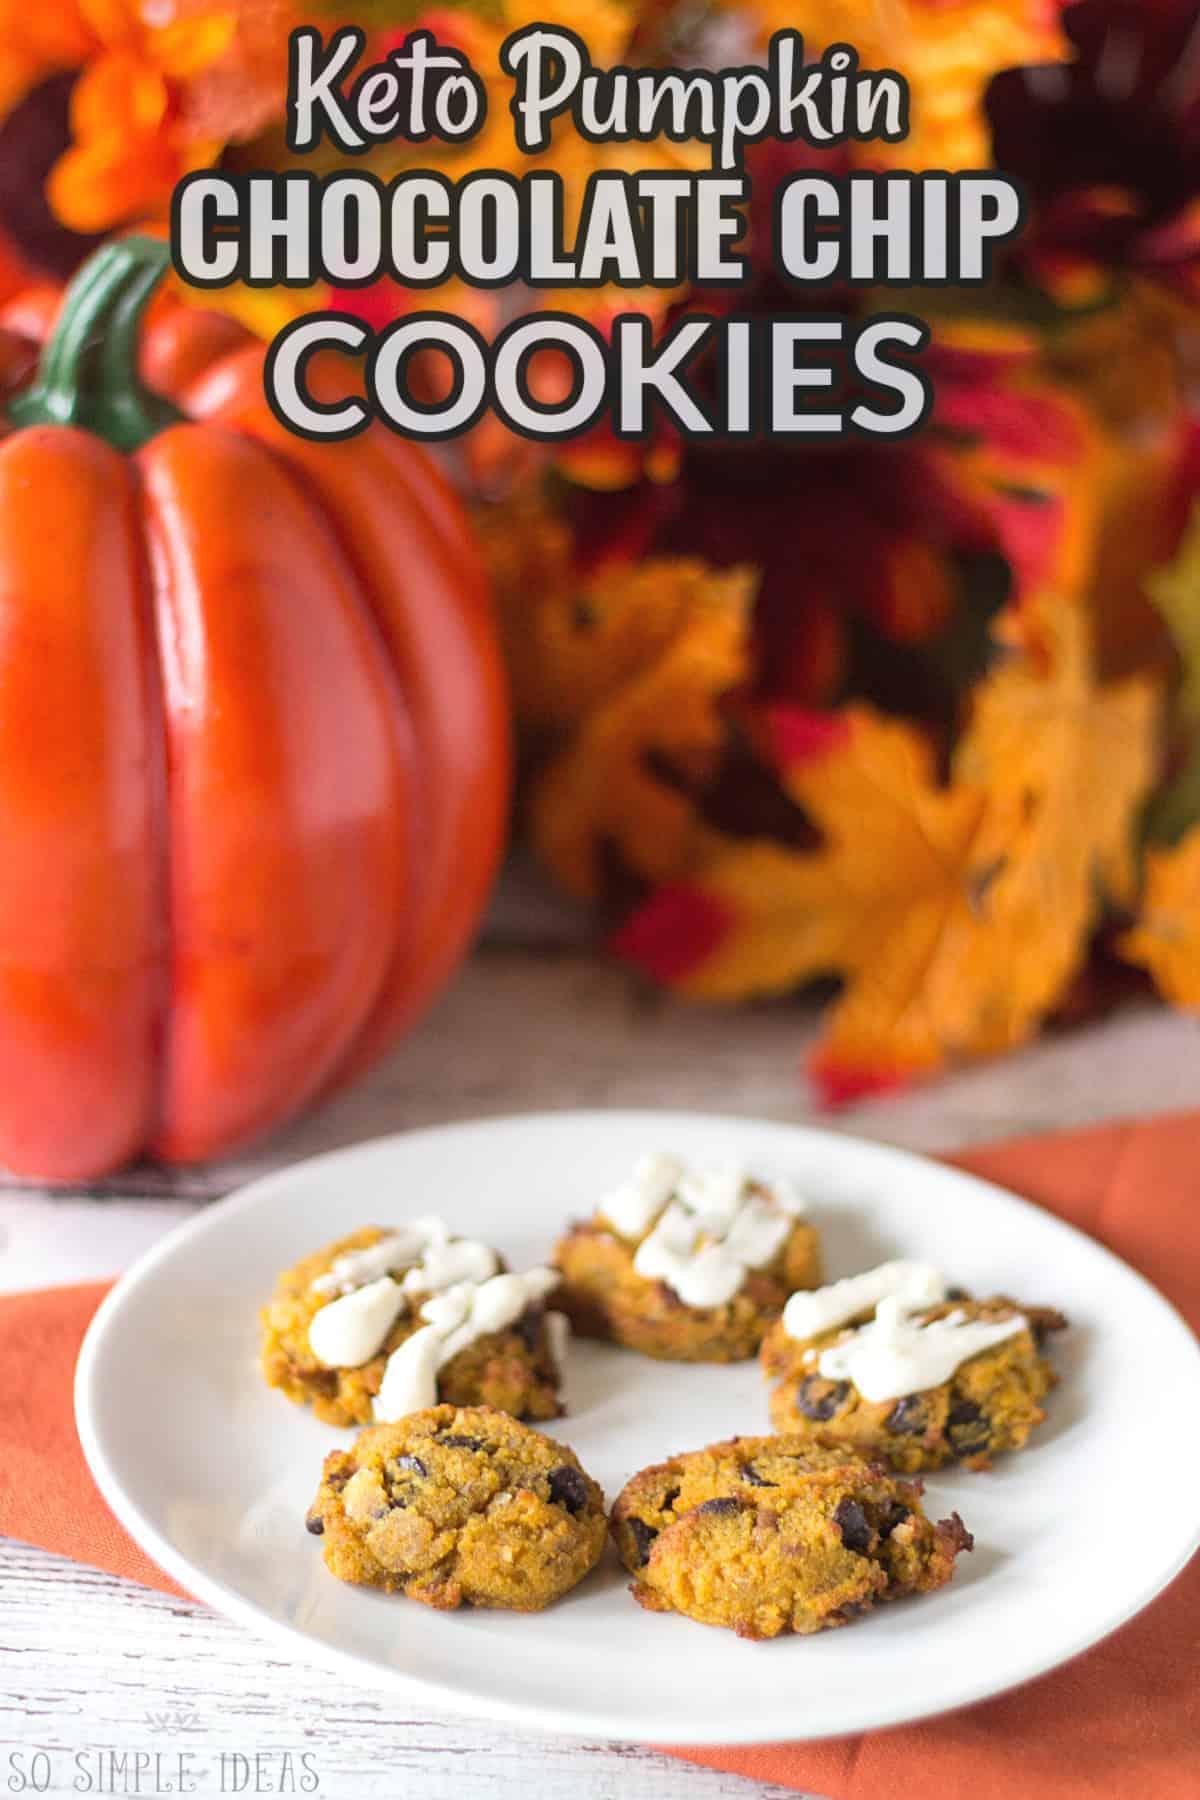 keto pumpkin chocolate chip cookies cover image